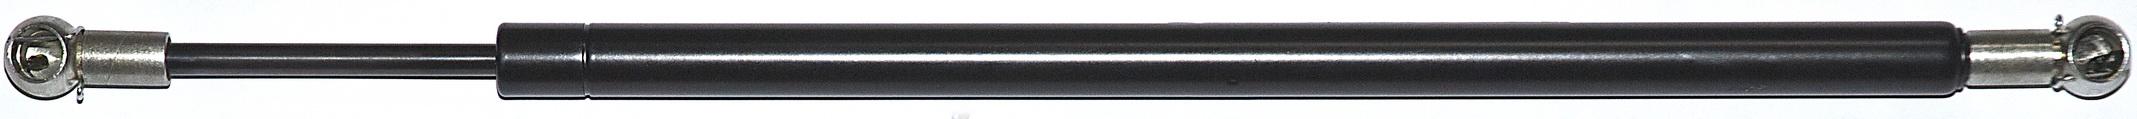 2 x YOU.S Gasfeder für Deutz Agrotron New 80-120 135-195 200 230 260 Dachluke